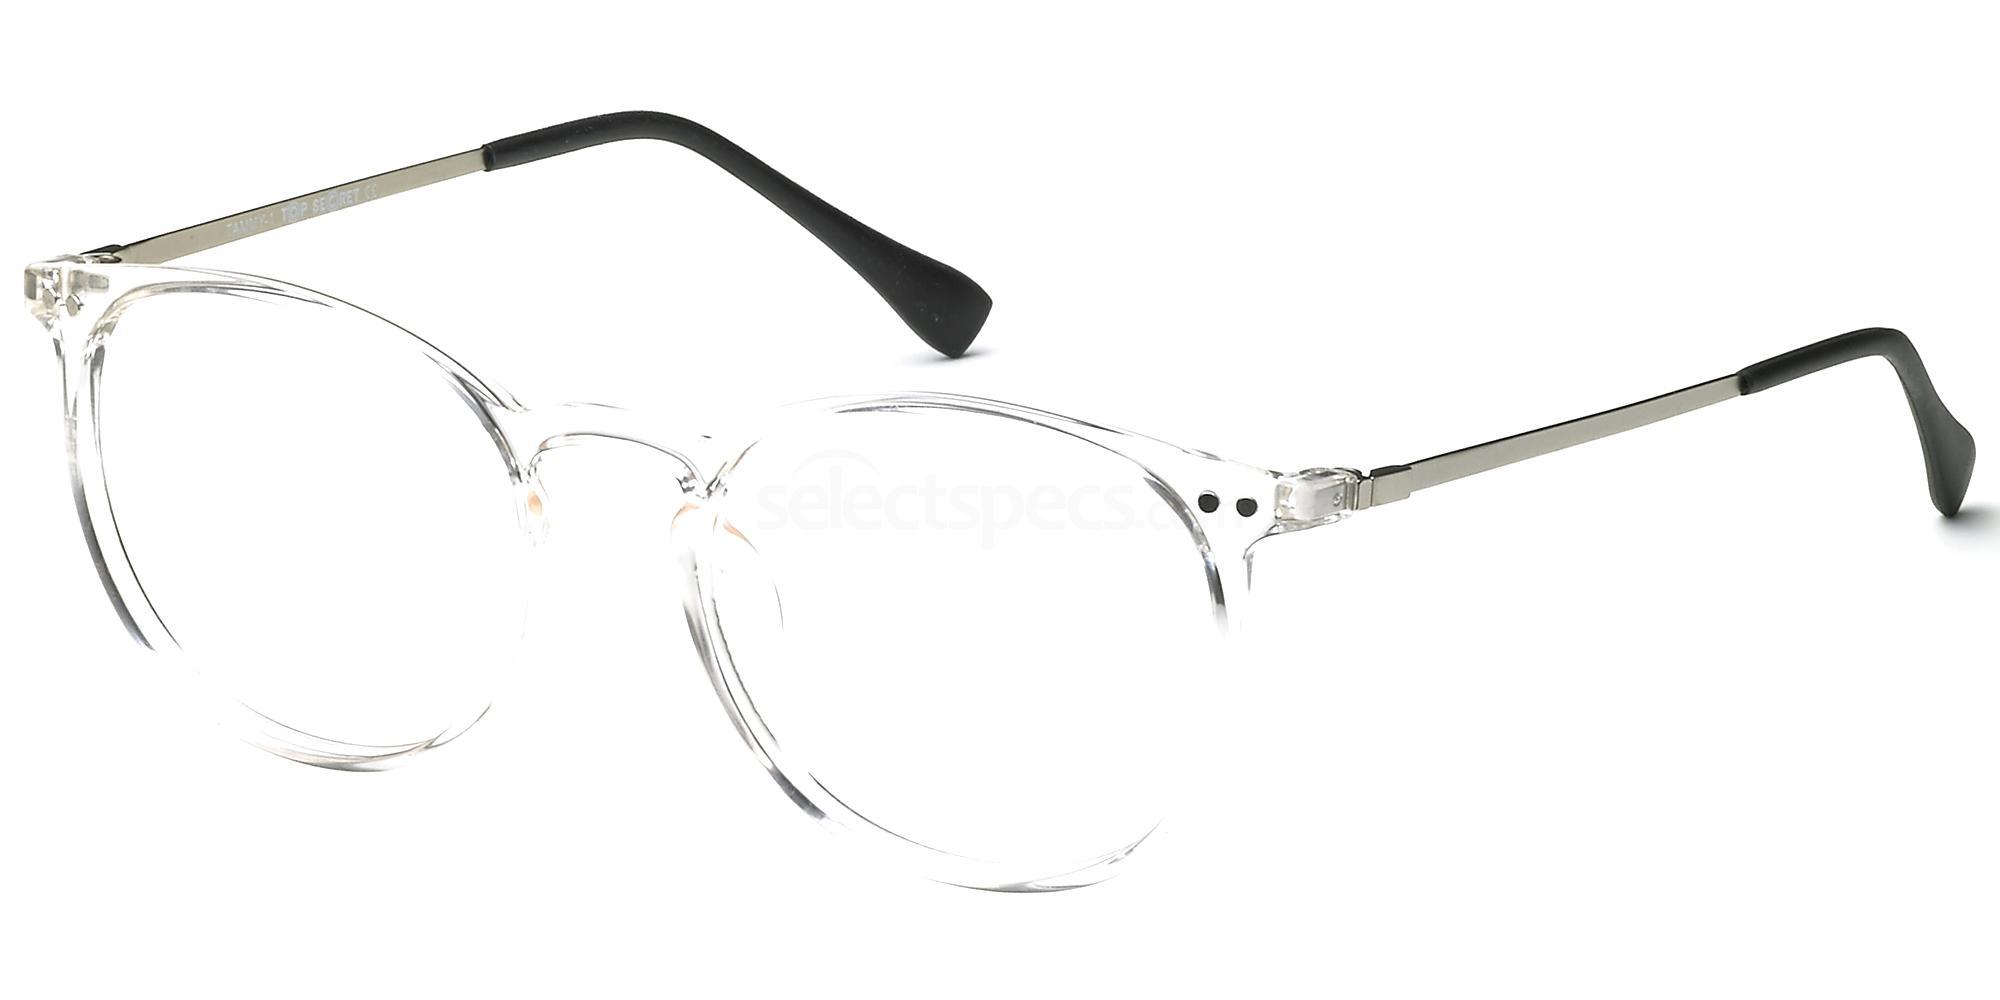 C1 TAMMY01 Glasses, Top Secret KIDS